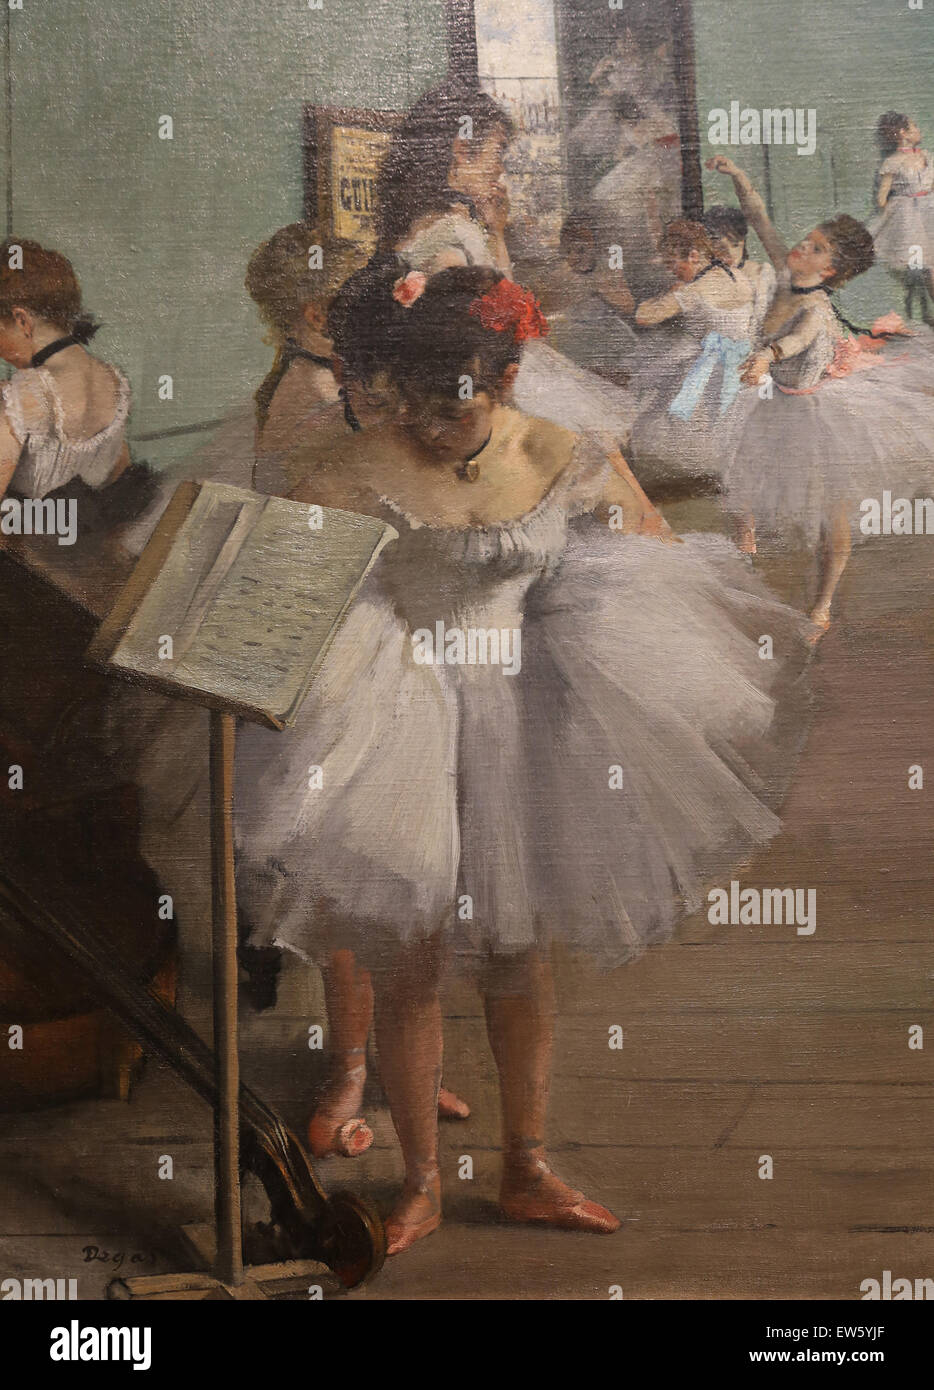 Edgar Degas (1834-1917). Pittore Francese. La classe di danza, 1874. Olio su tela. Metropolitan Museum of Art. Ny. Immagini Stock